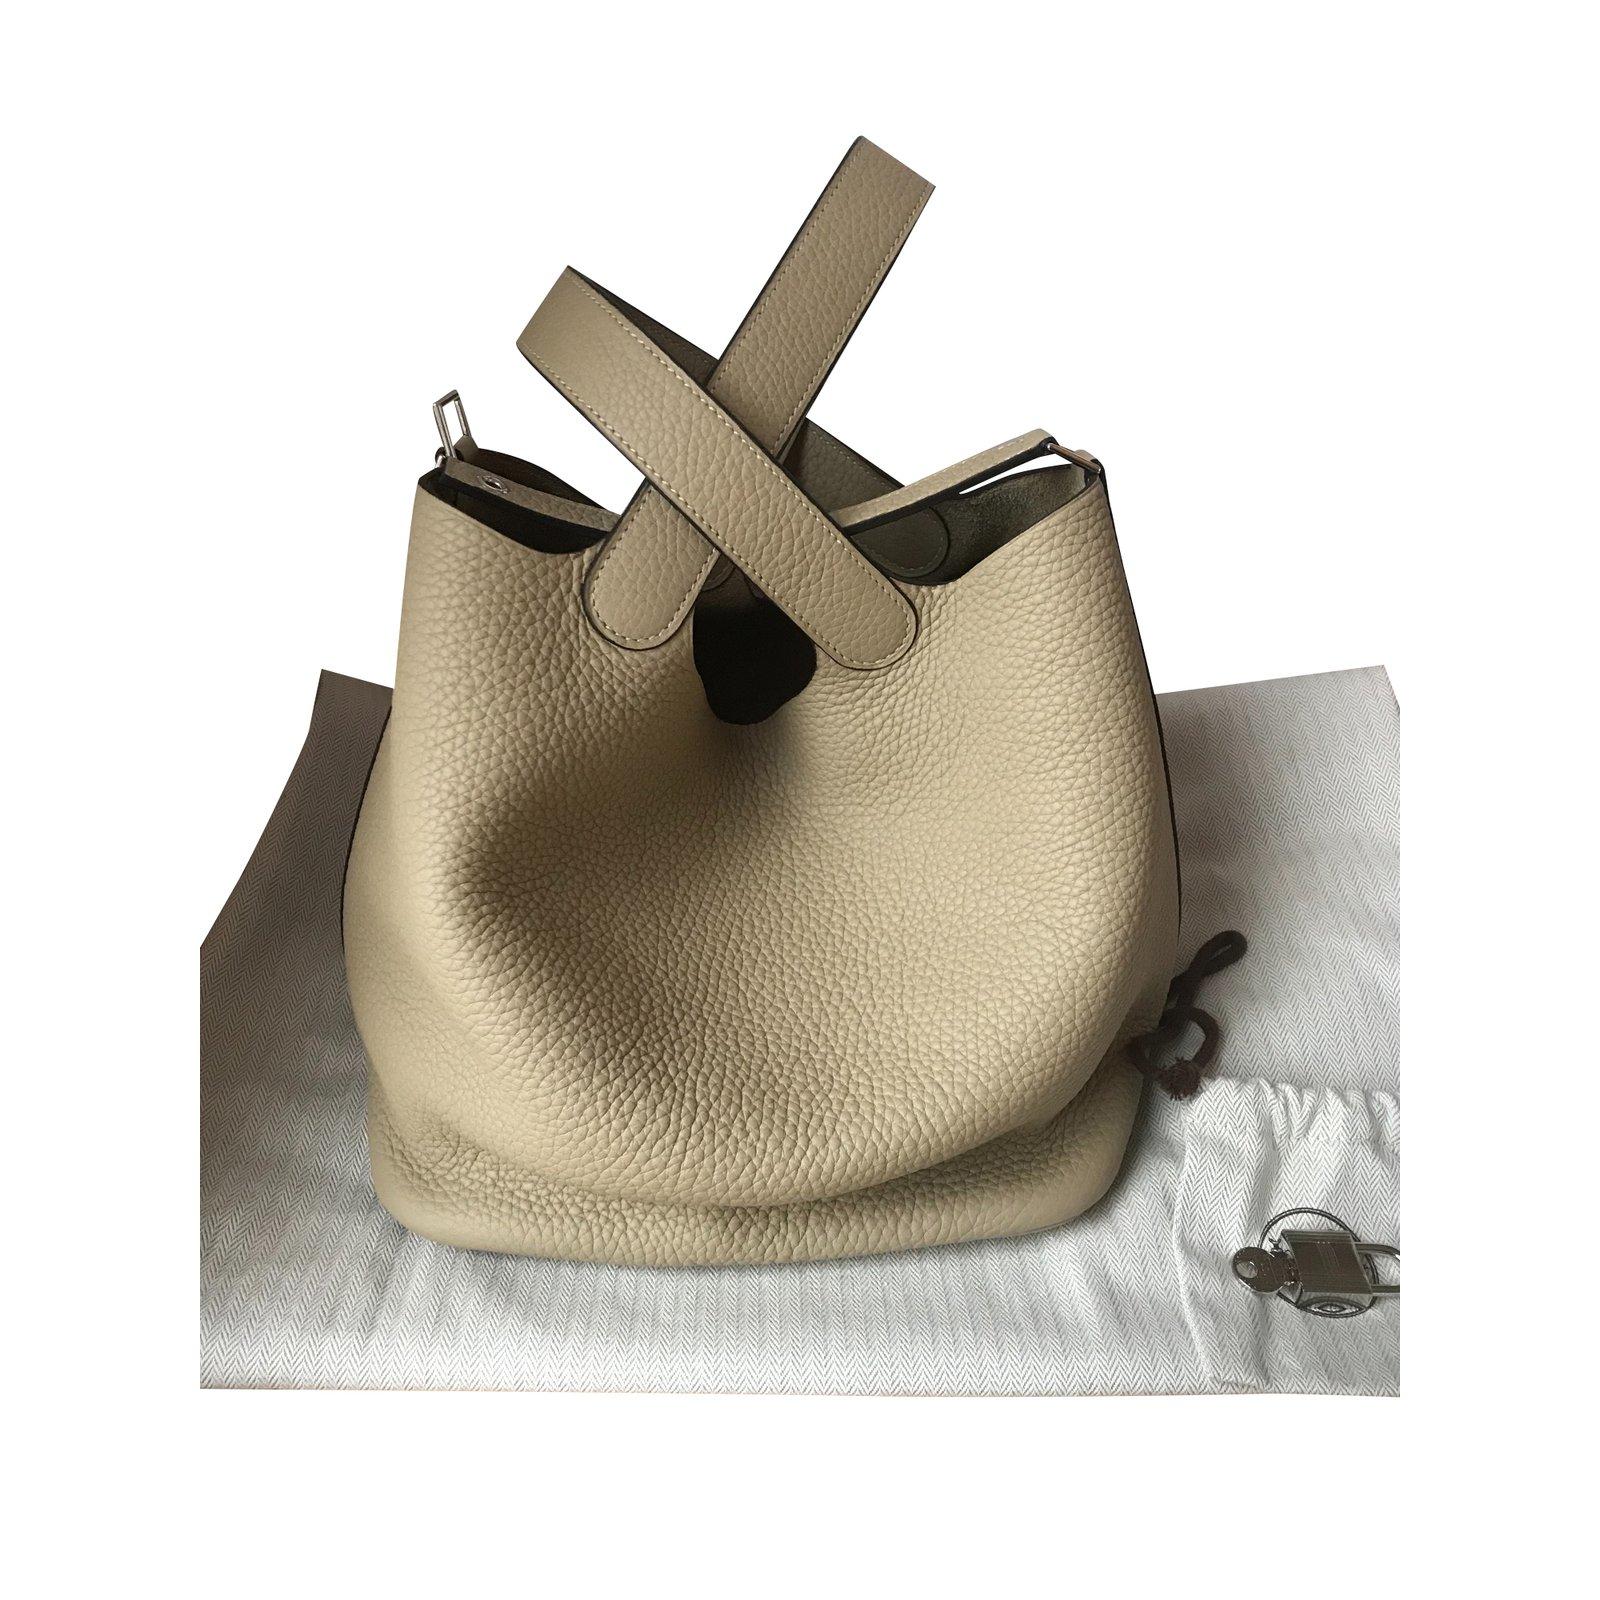 3d0fa0487a Sacs à main Hermès Sac Hermès Picotin Lock 22 couleur Trench Cuir Beige  ref.100021